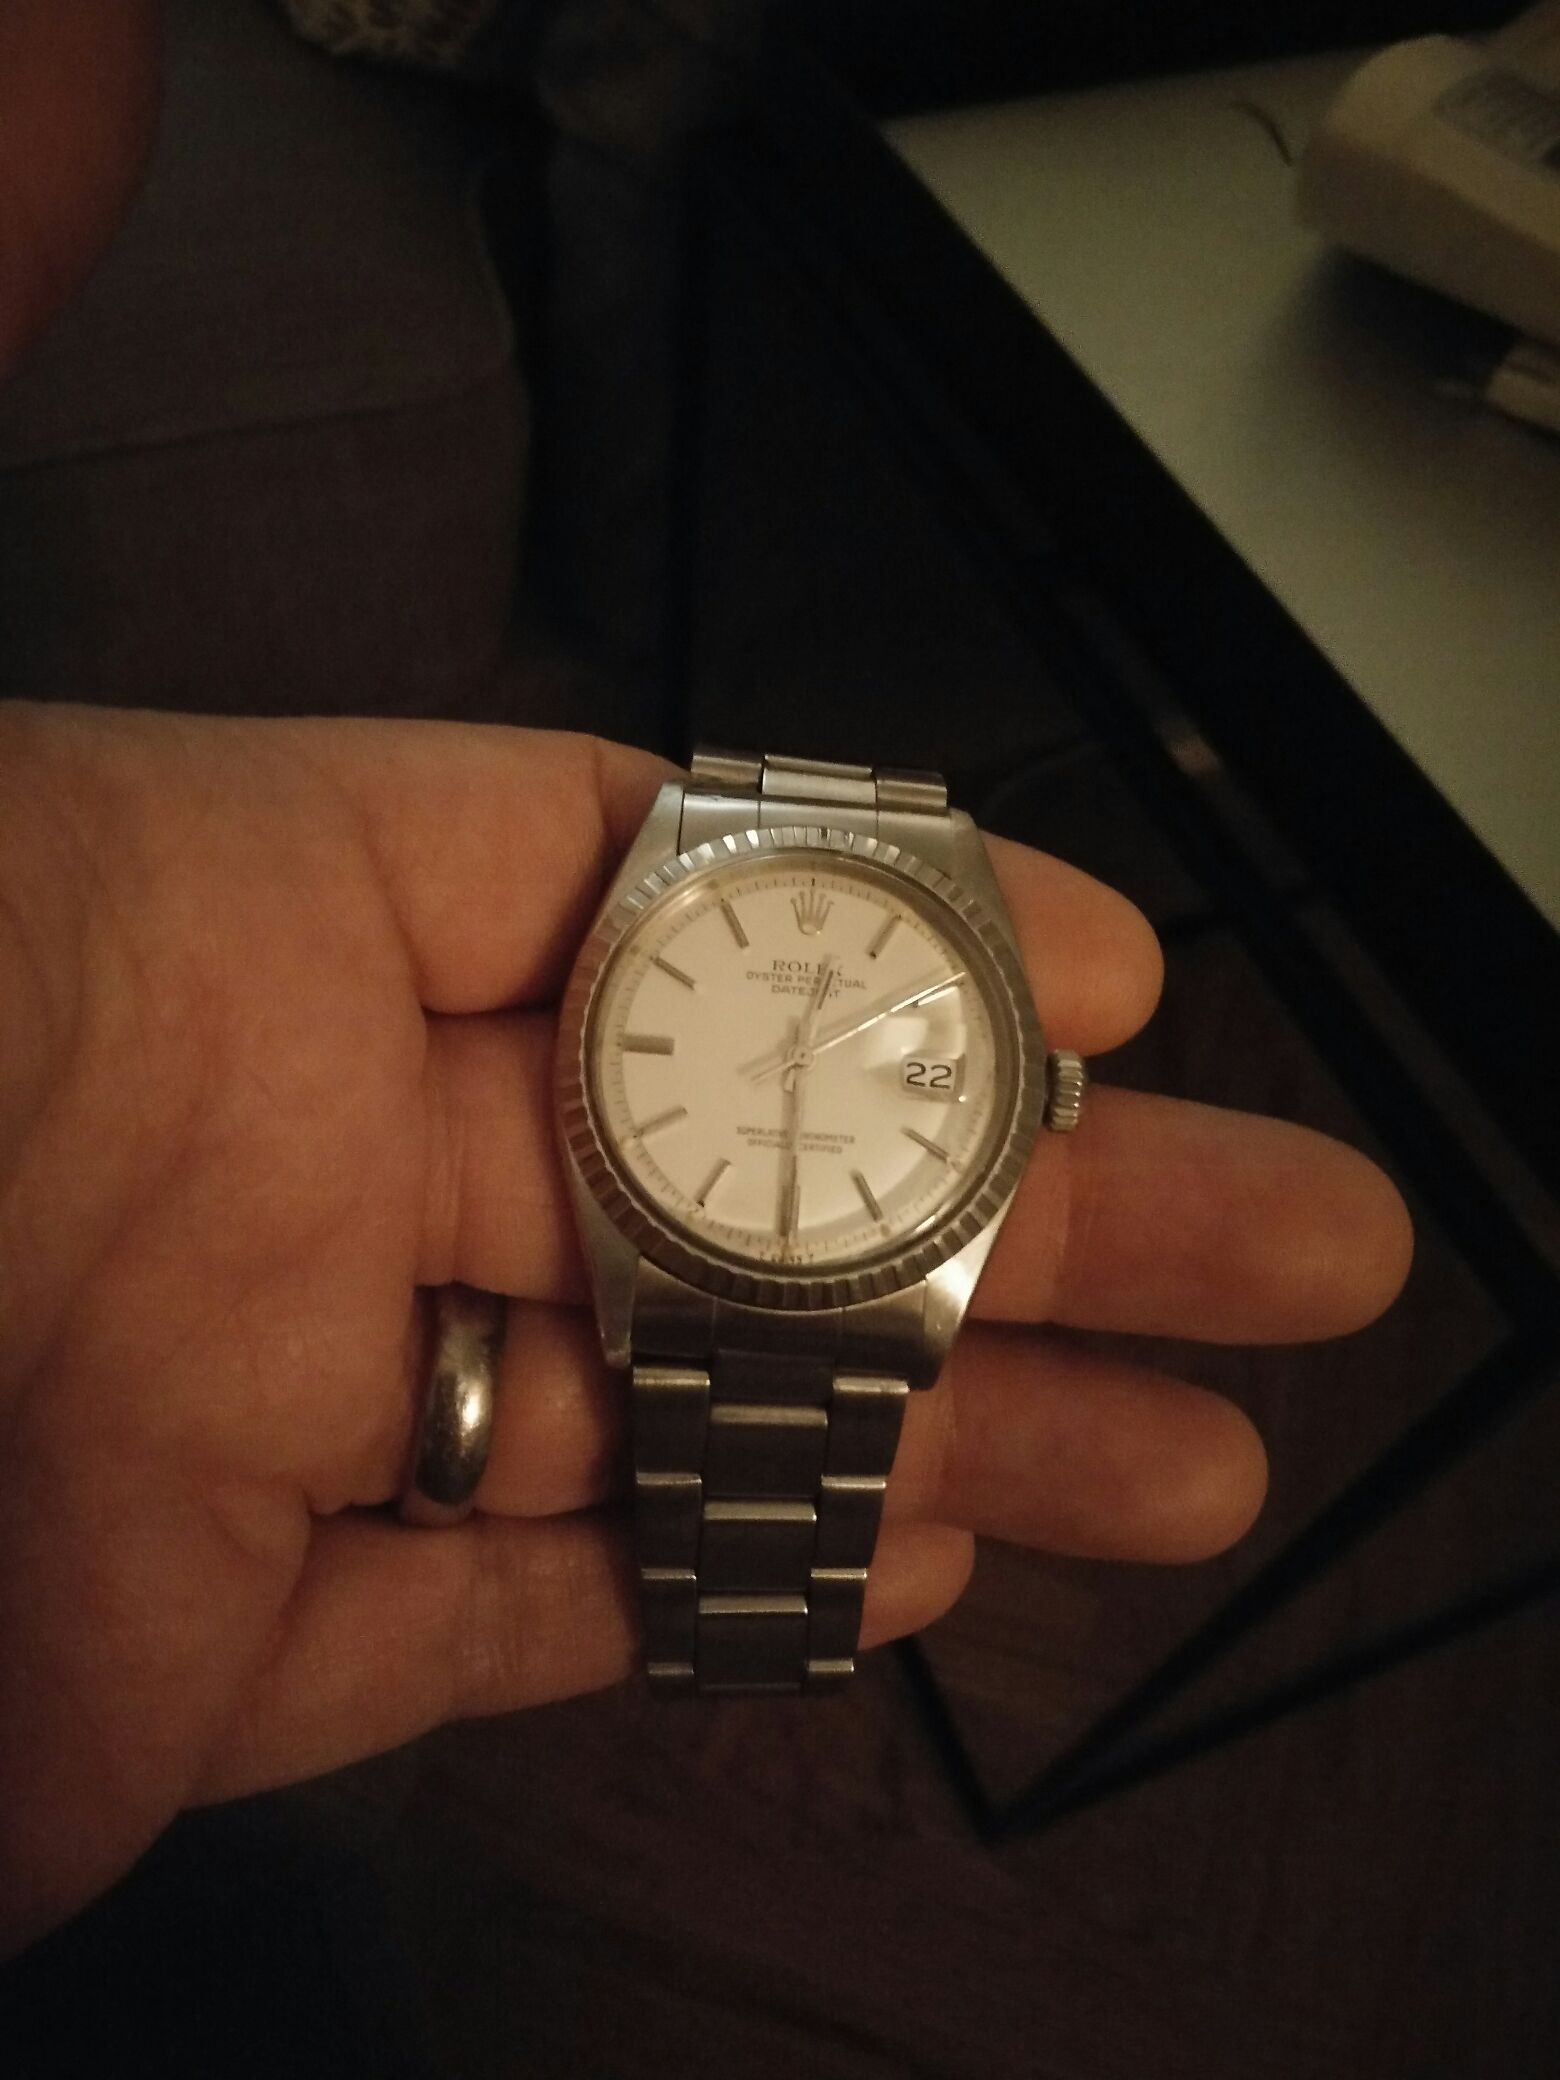 Rolex Datejust 1603 Watch Rolex 1603 From Sort It Apps